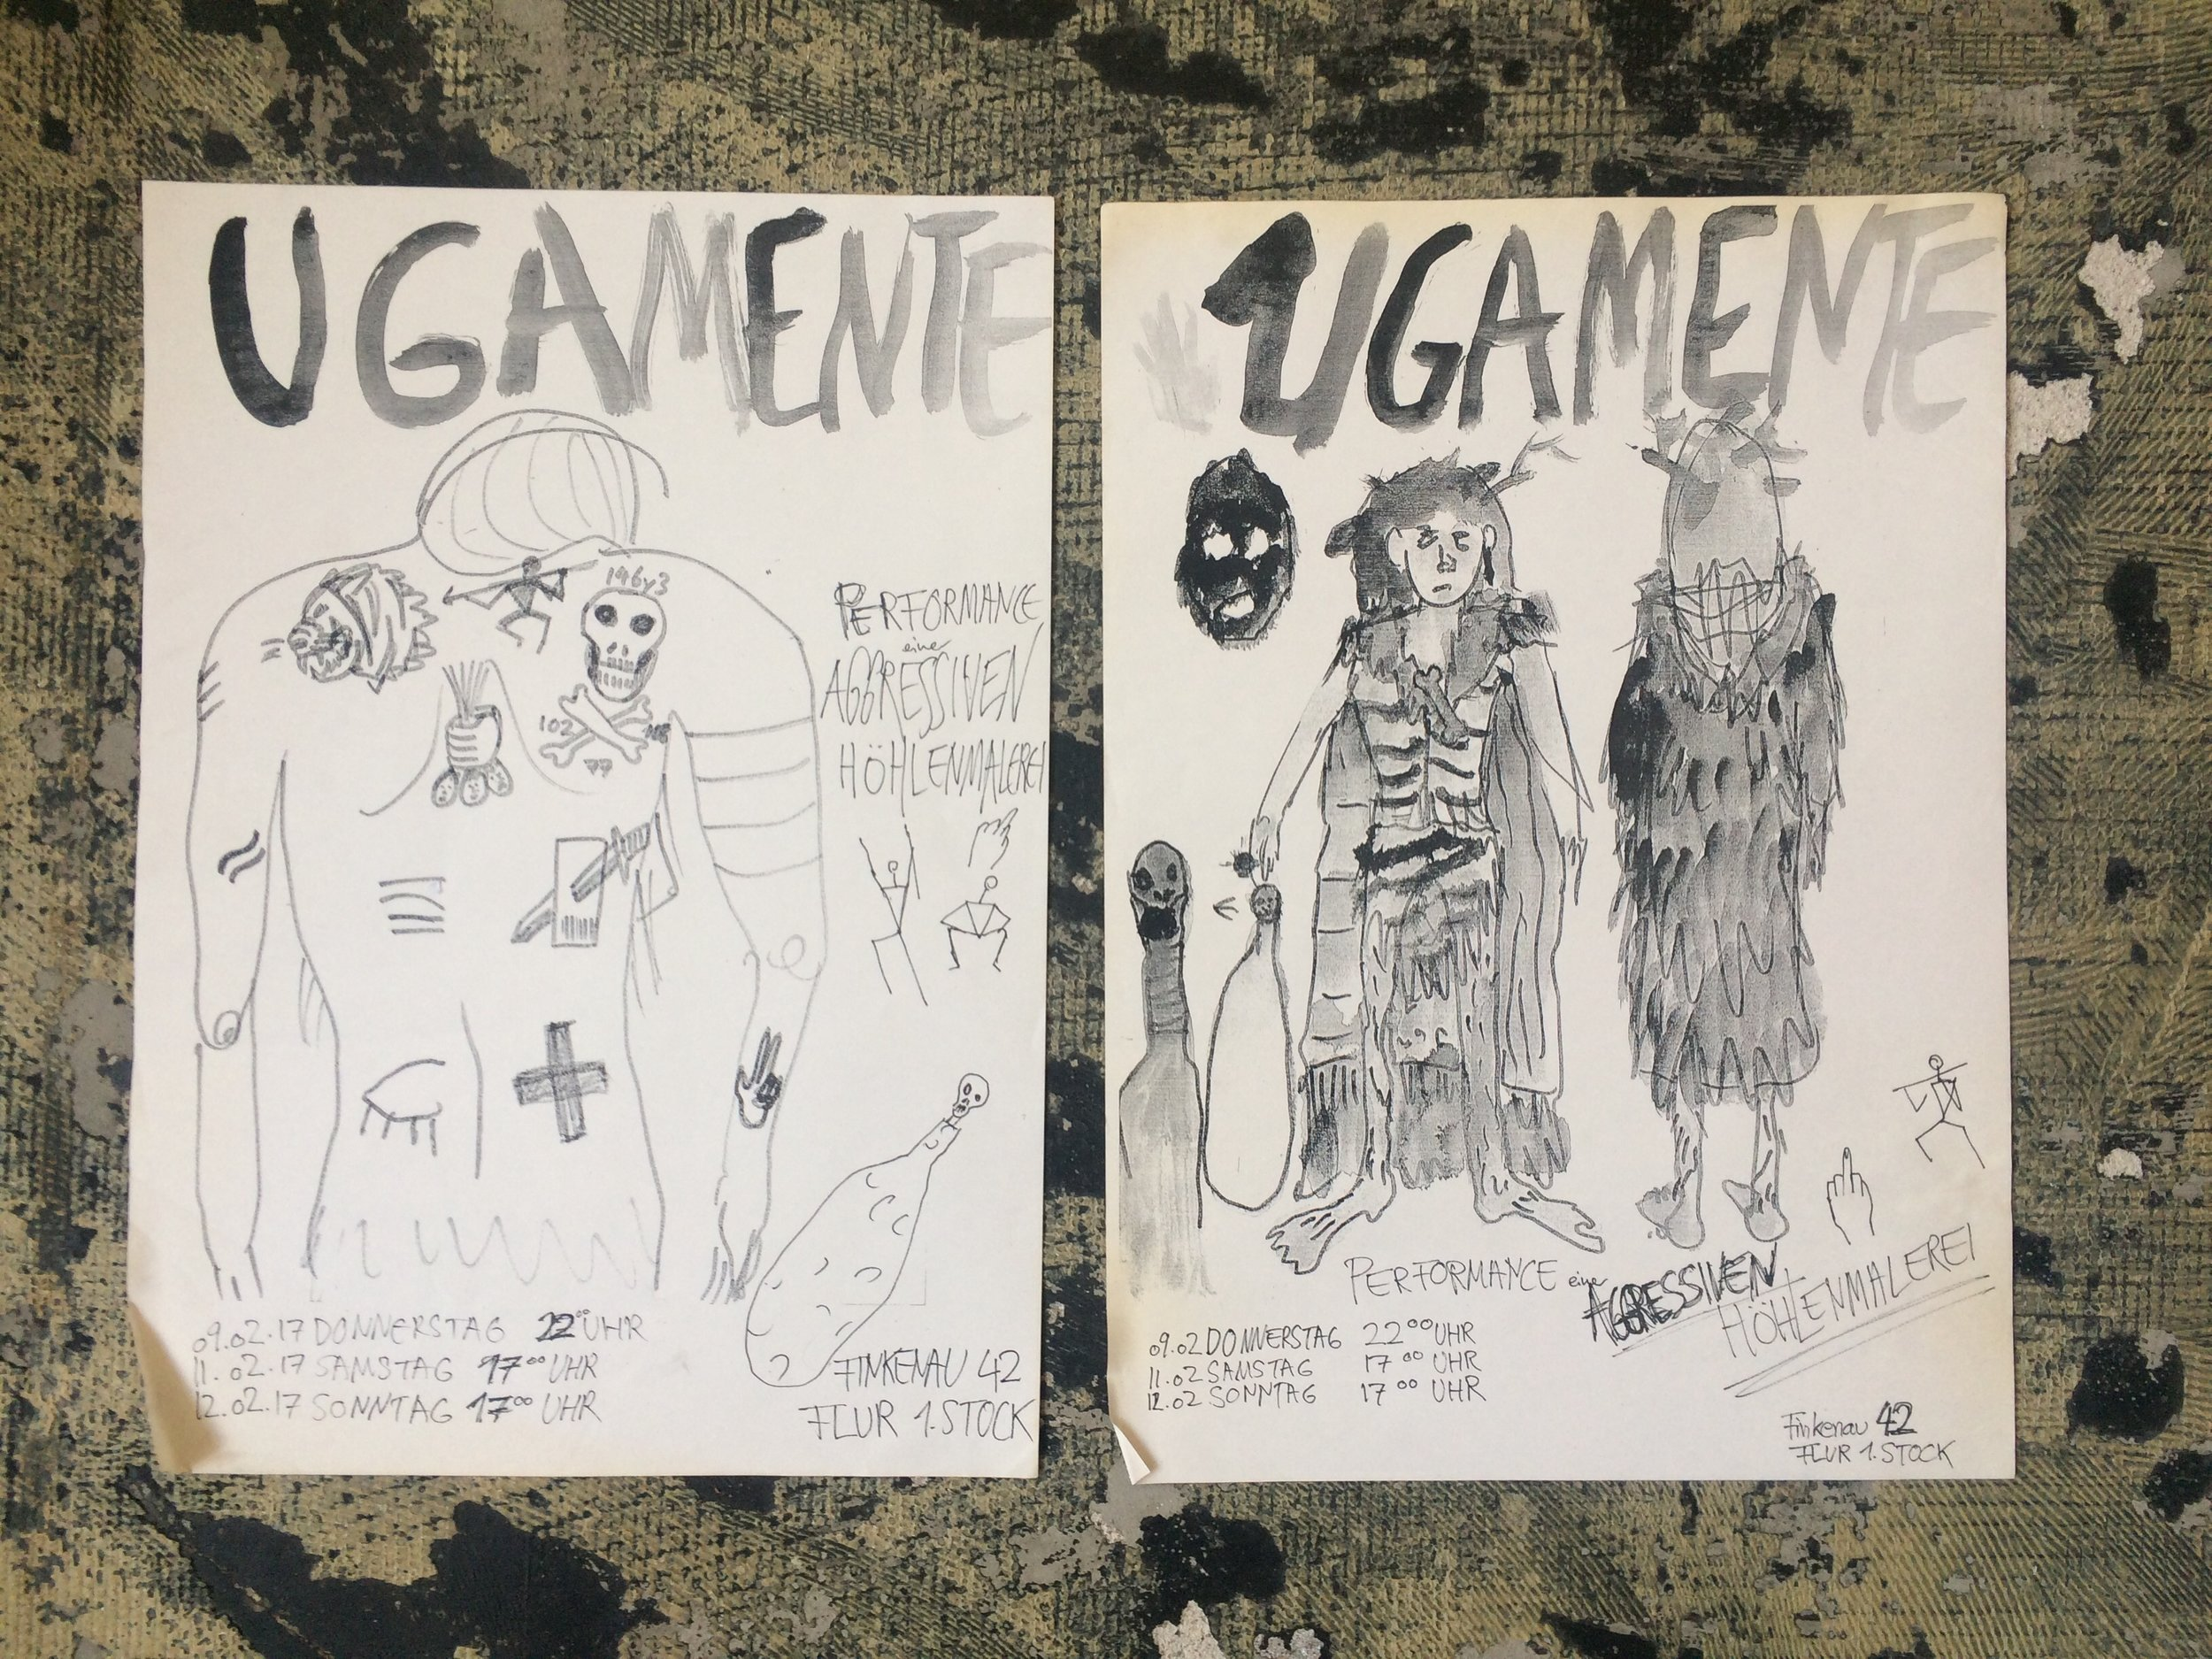 UGAMENTE - agressive cave painting